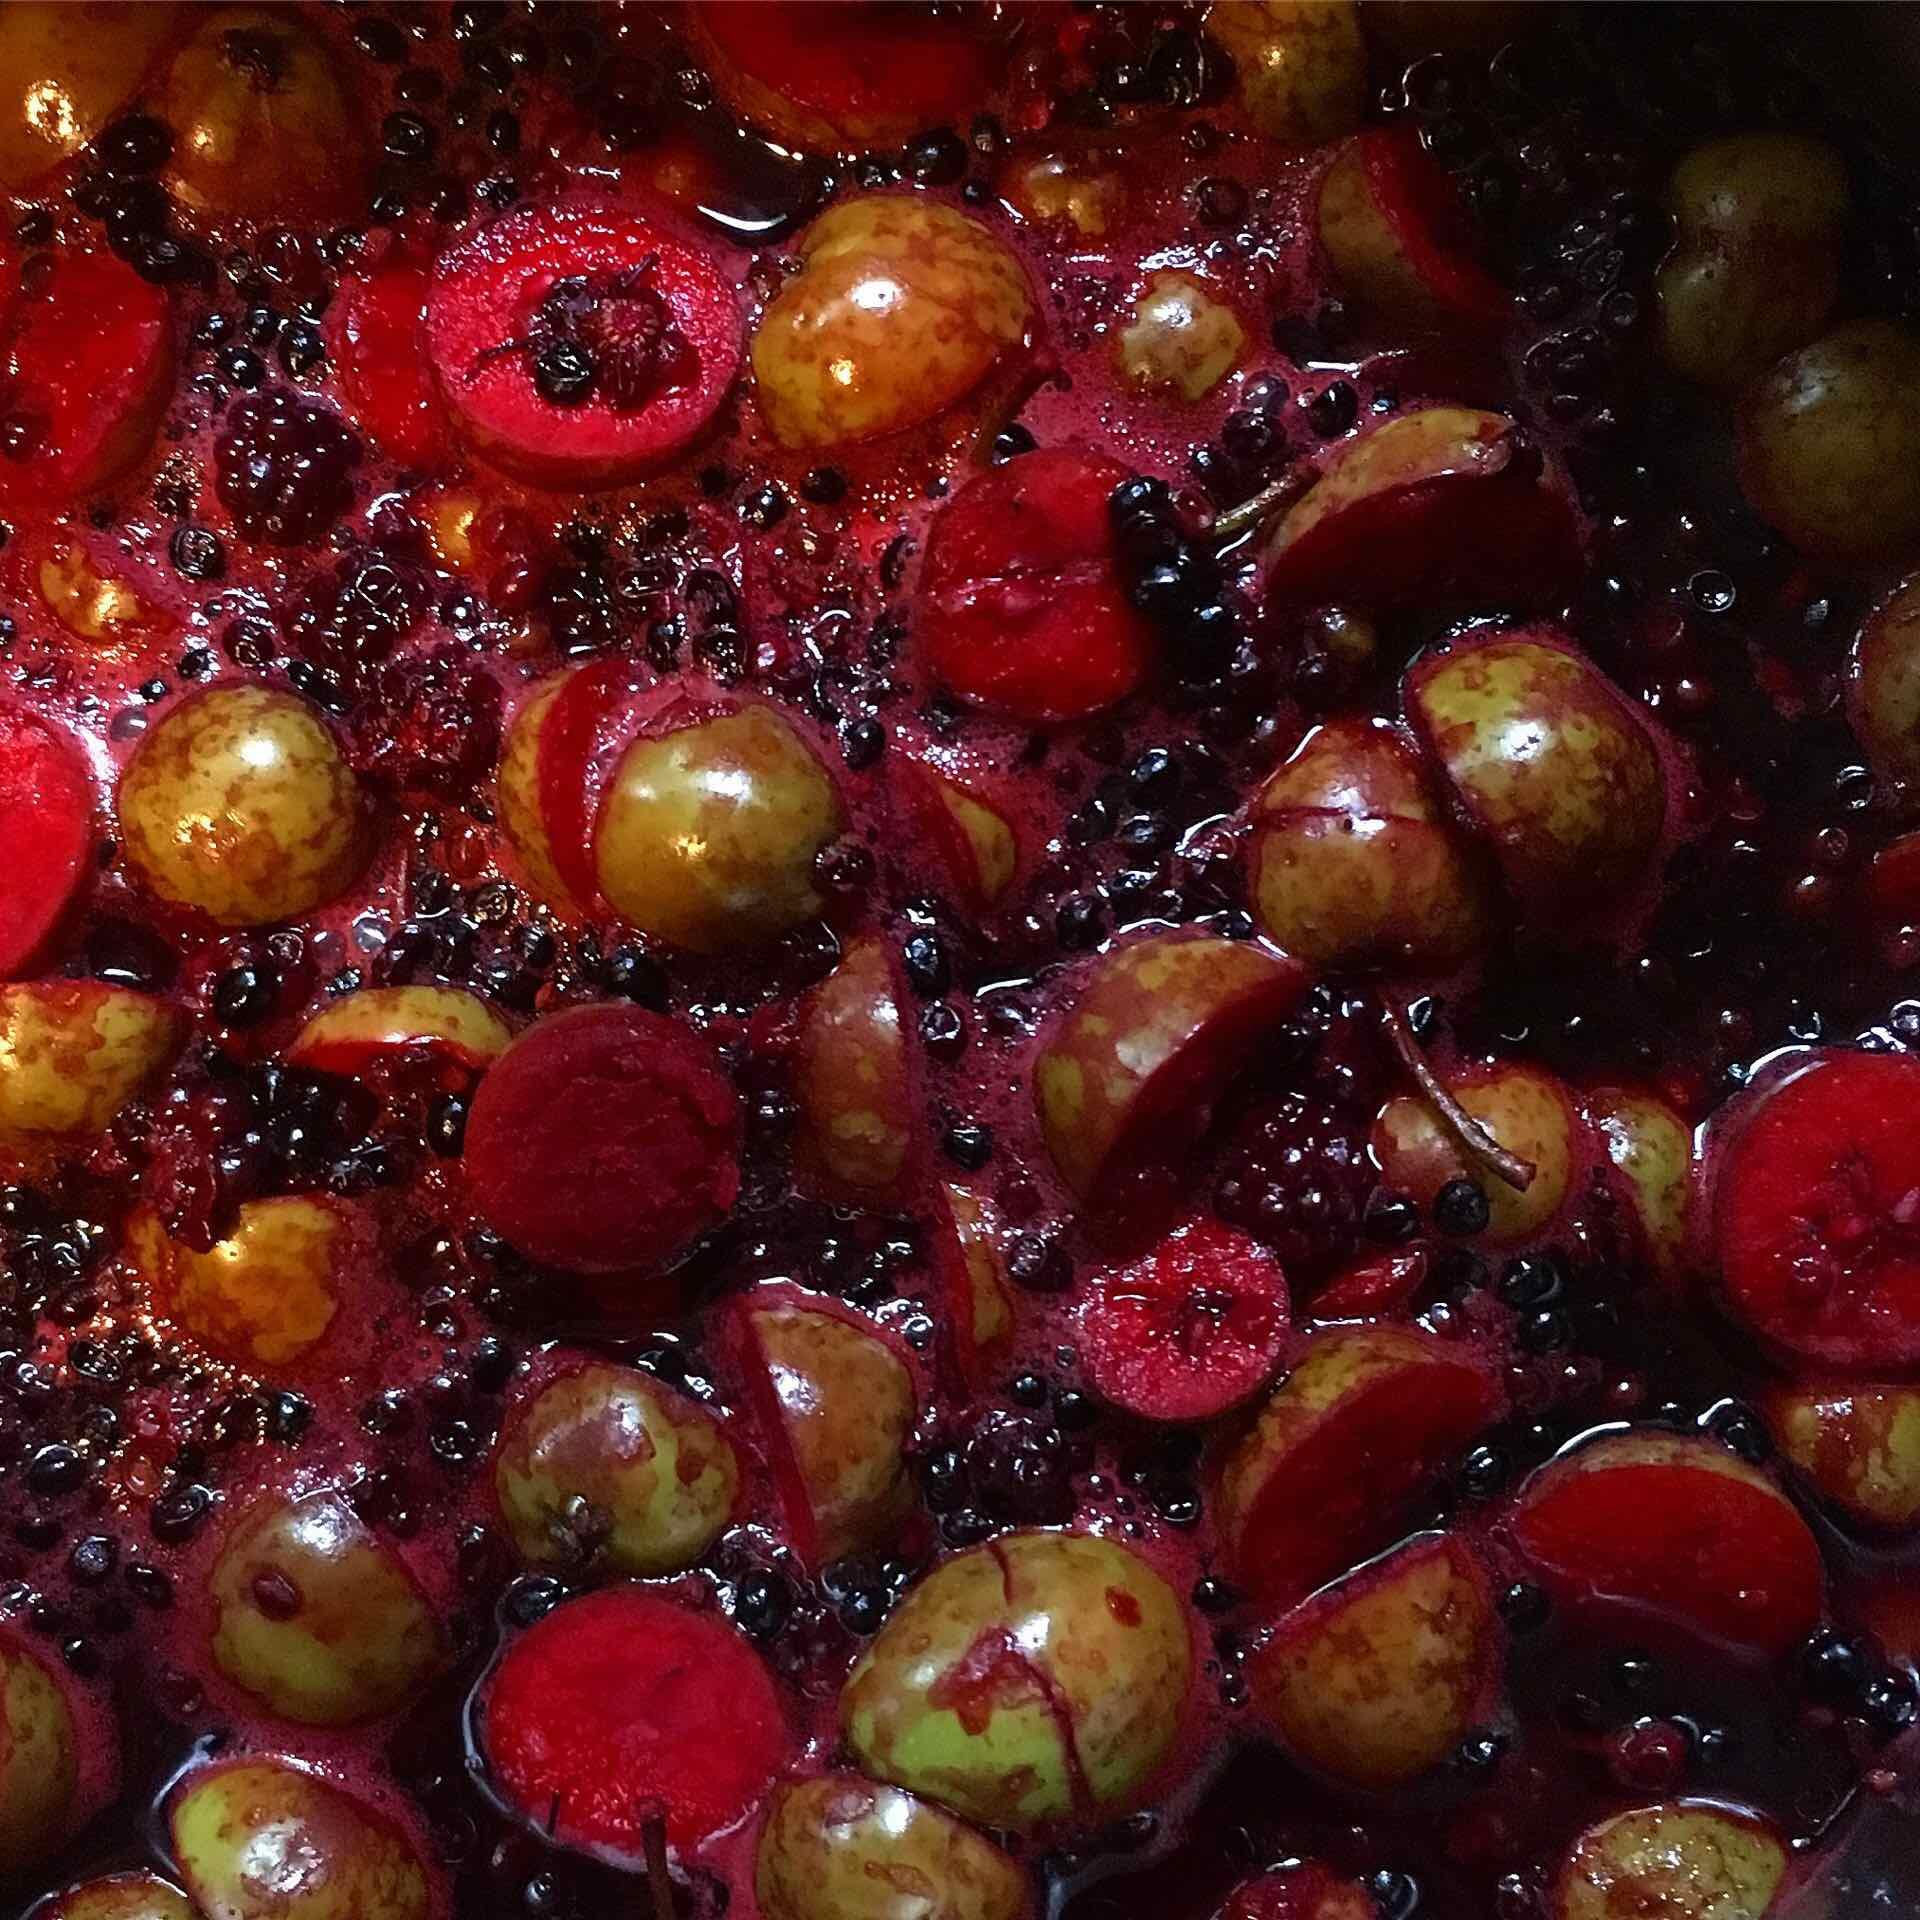 Autumn fruits